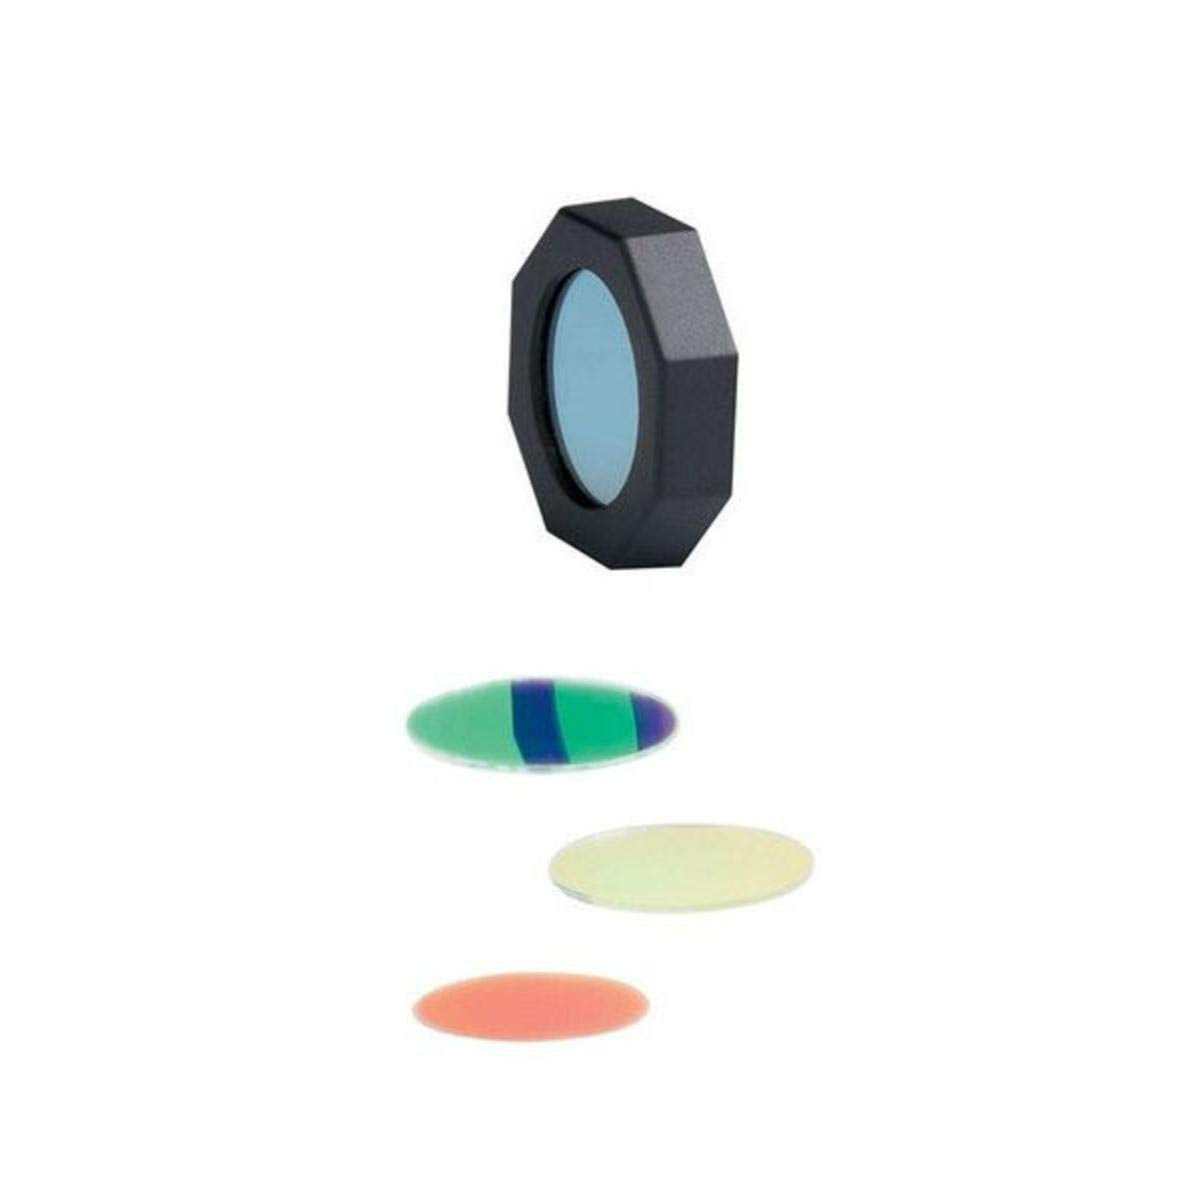 Led Lenser 501038 filtro de iluminación - Filtro de luz (Multicolor, Led Lenser MT10, 3,25 cm)